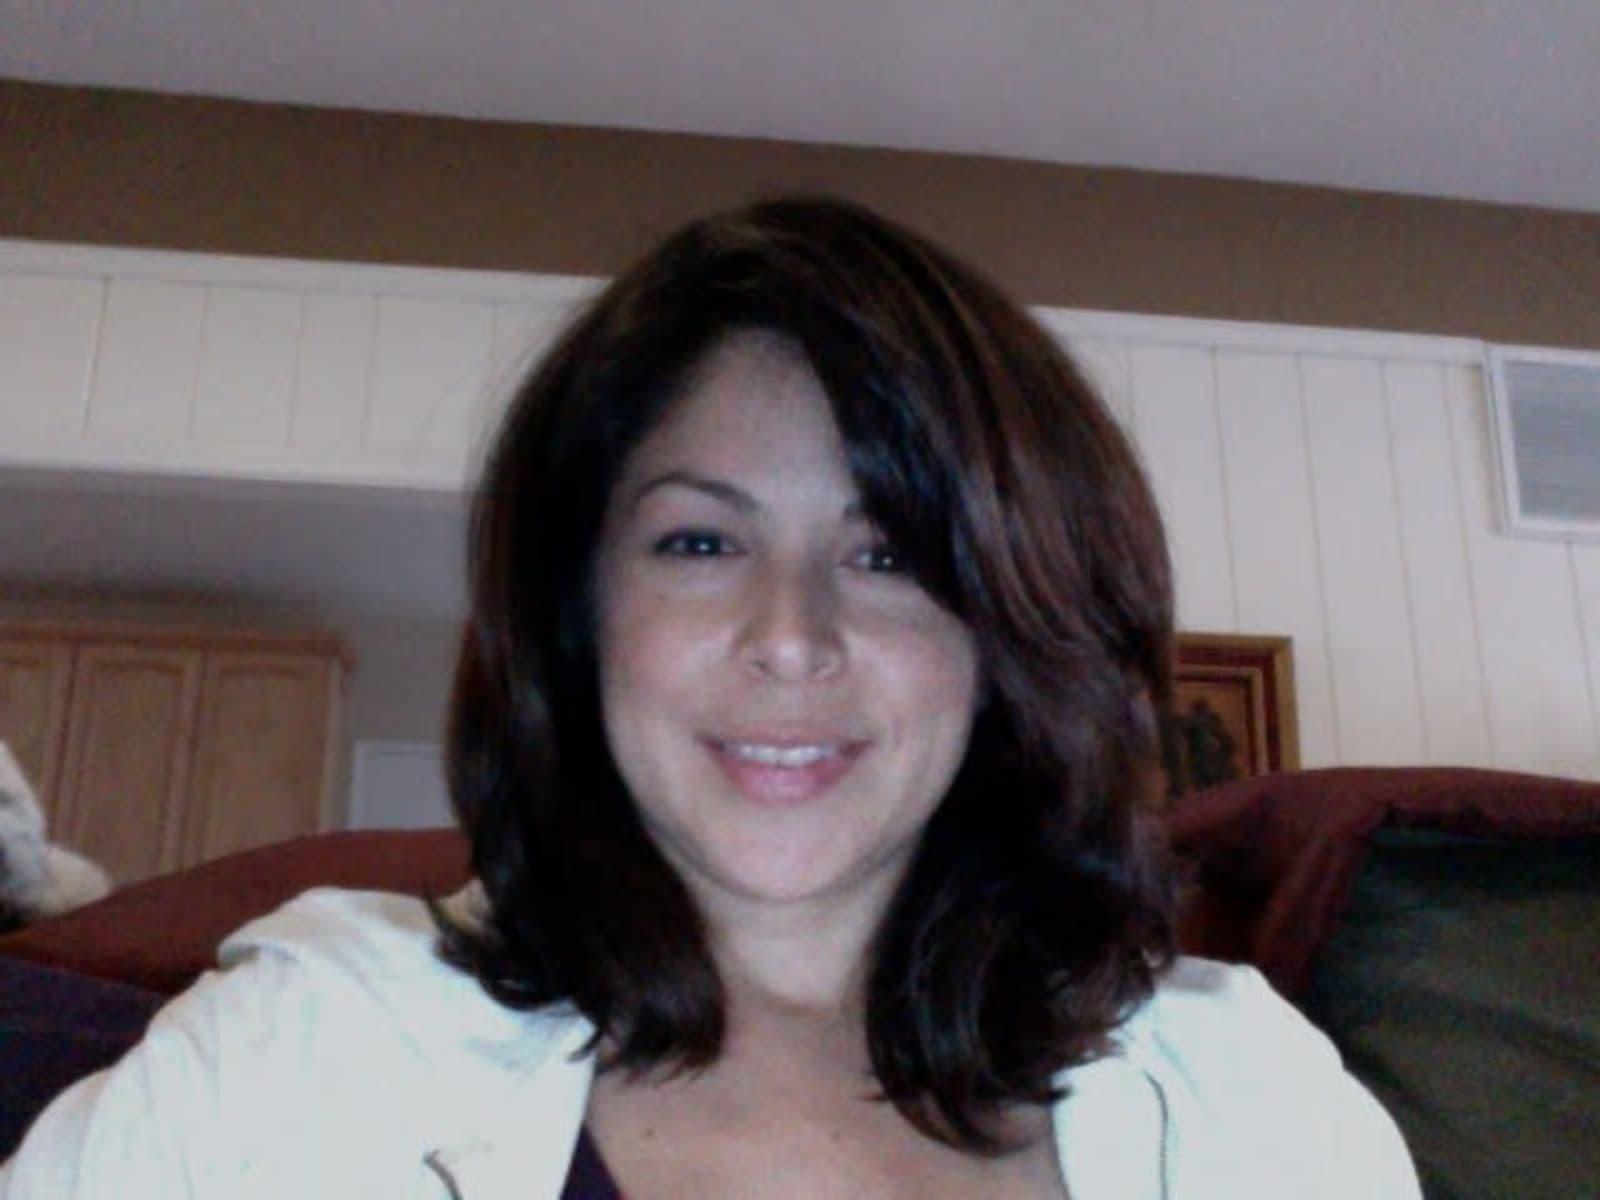 Donna from San Luis Obispo, California, United States